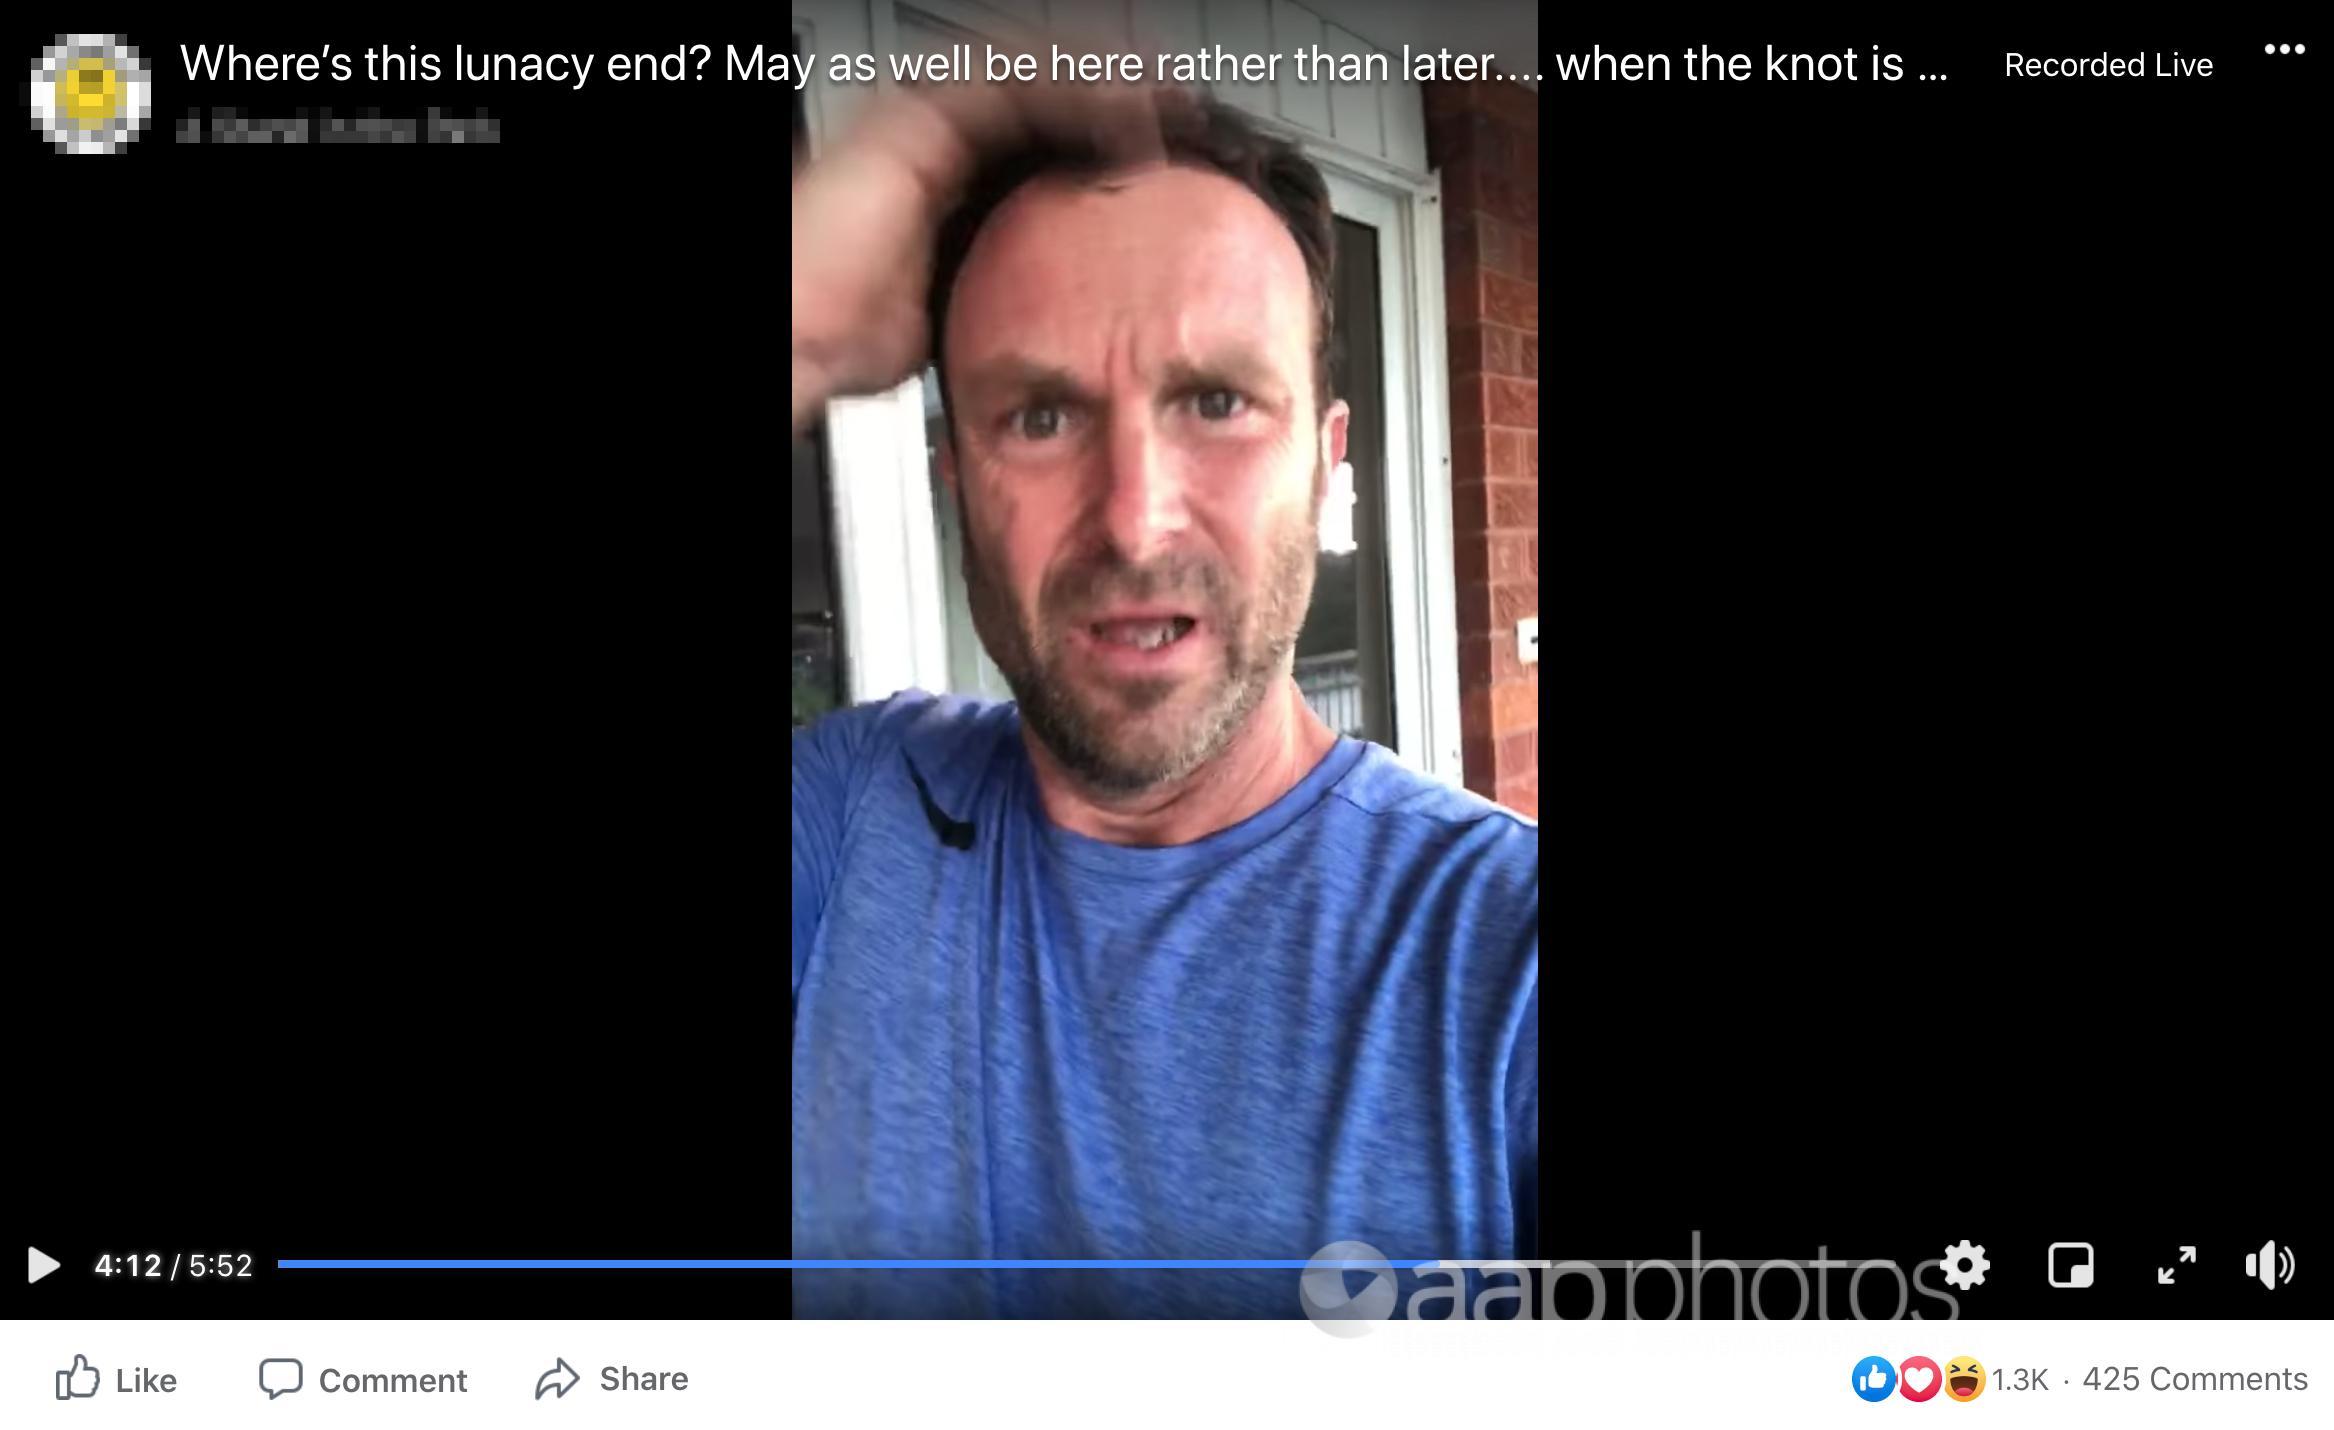 A screenshot of the Facebook video